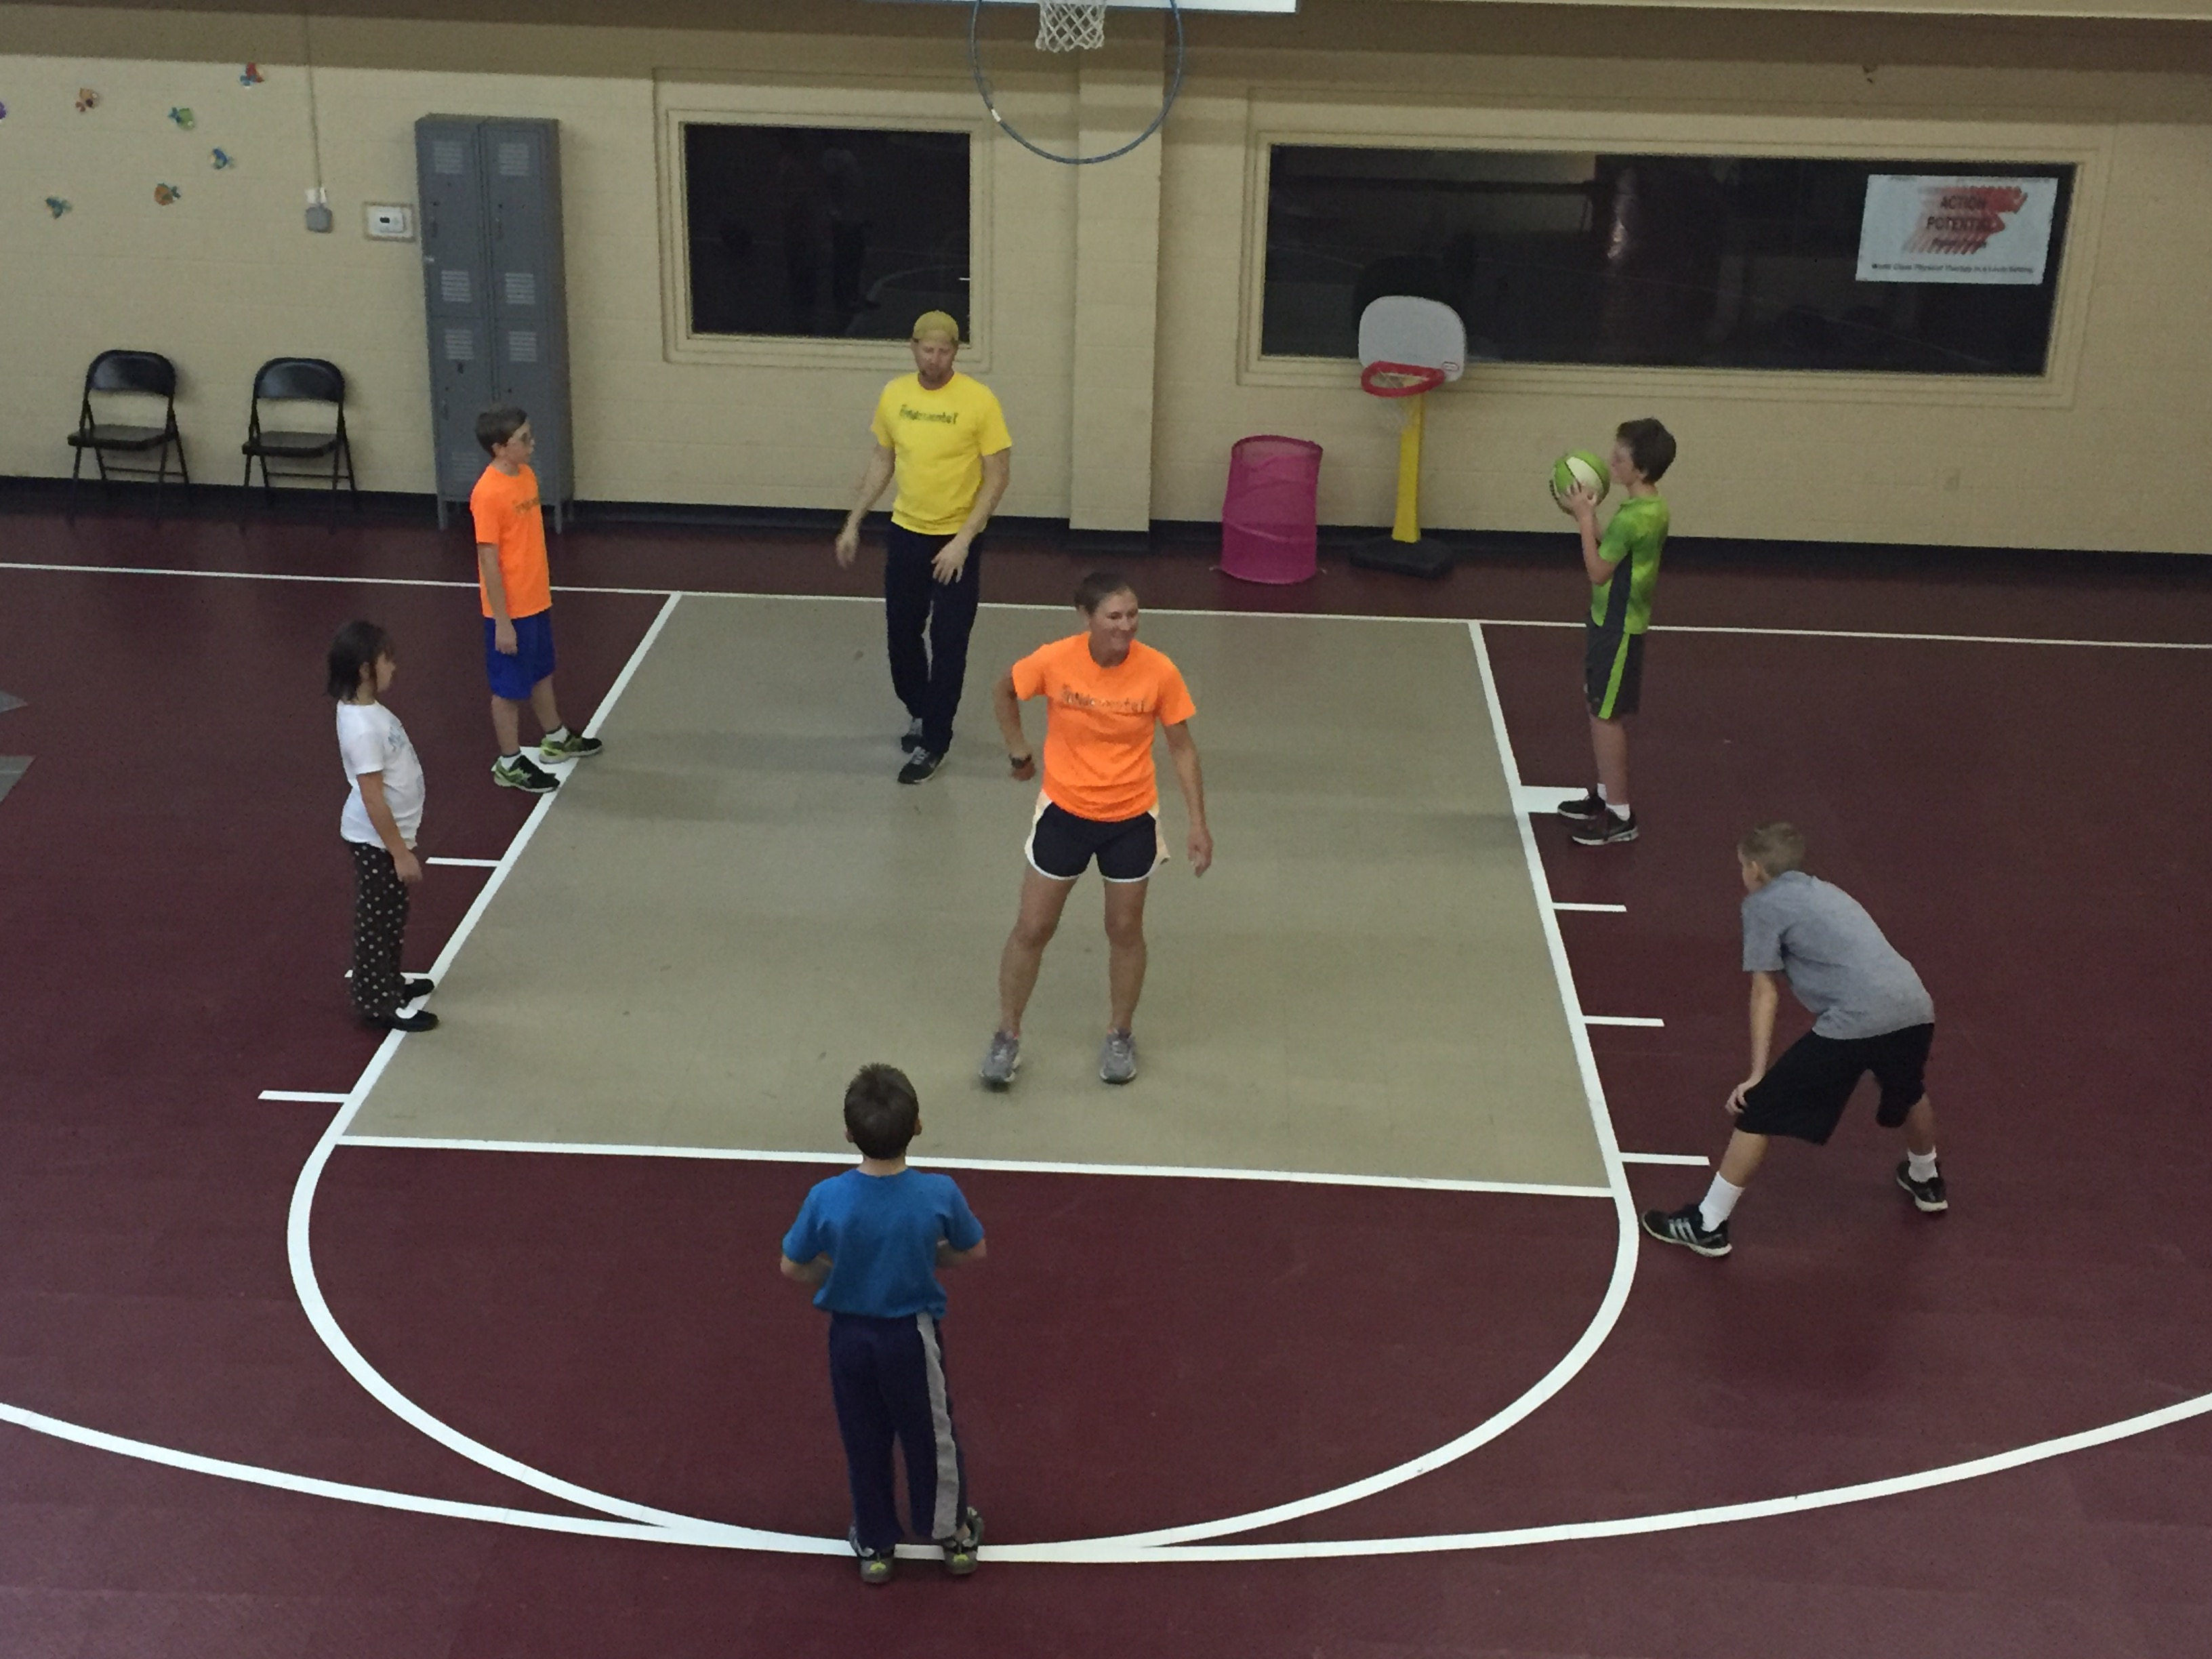 Basketball passing & shooting skills